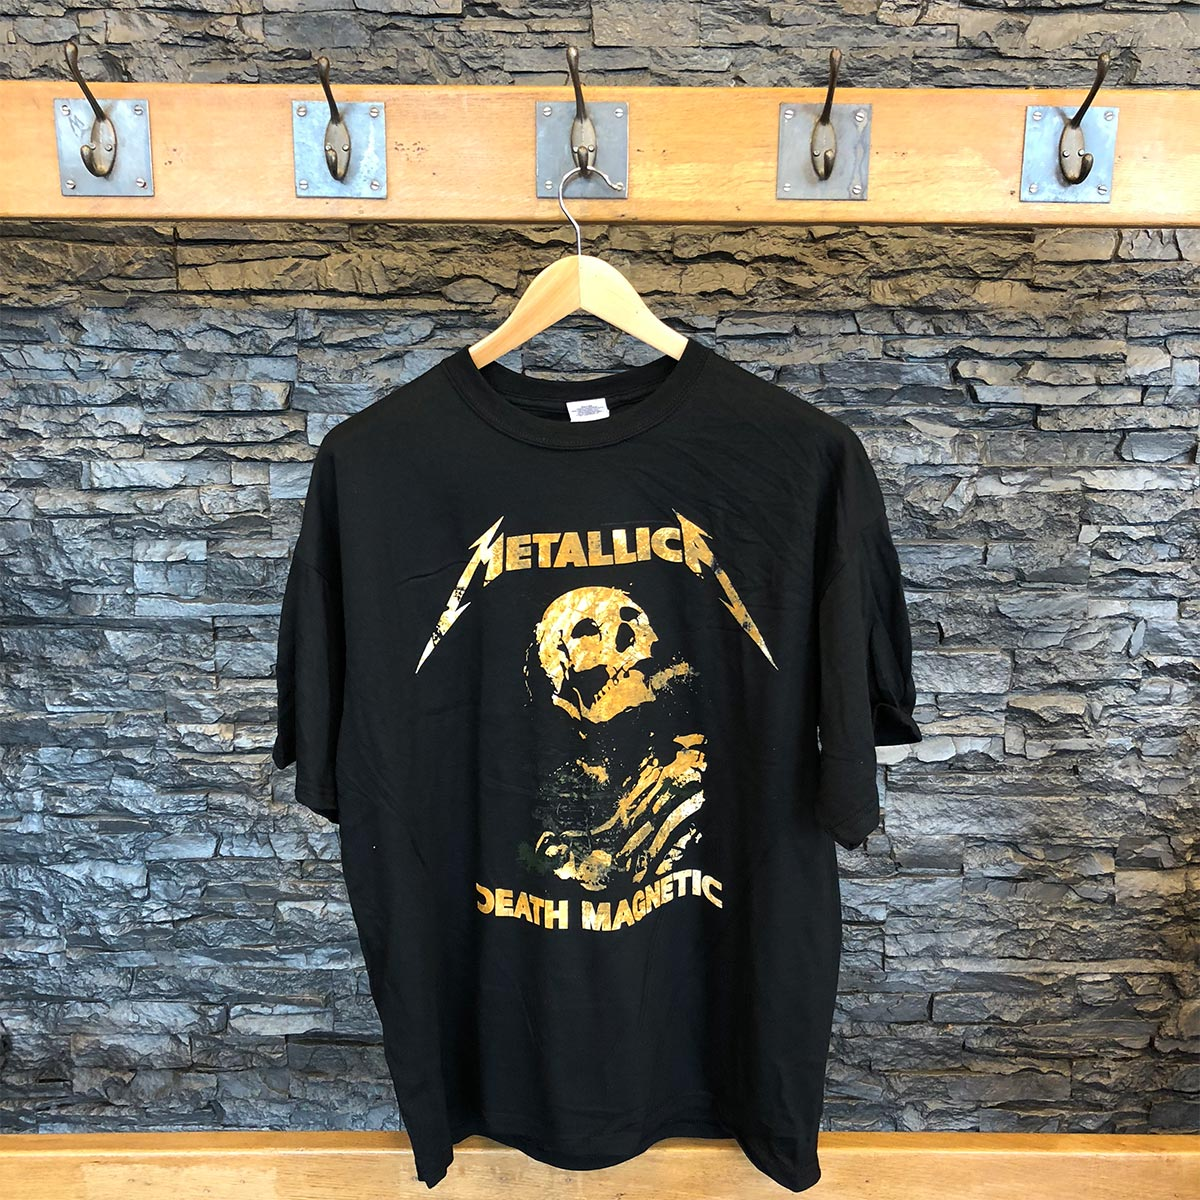 Death Magnetic Skeleton - Black Tee - Metallica